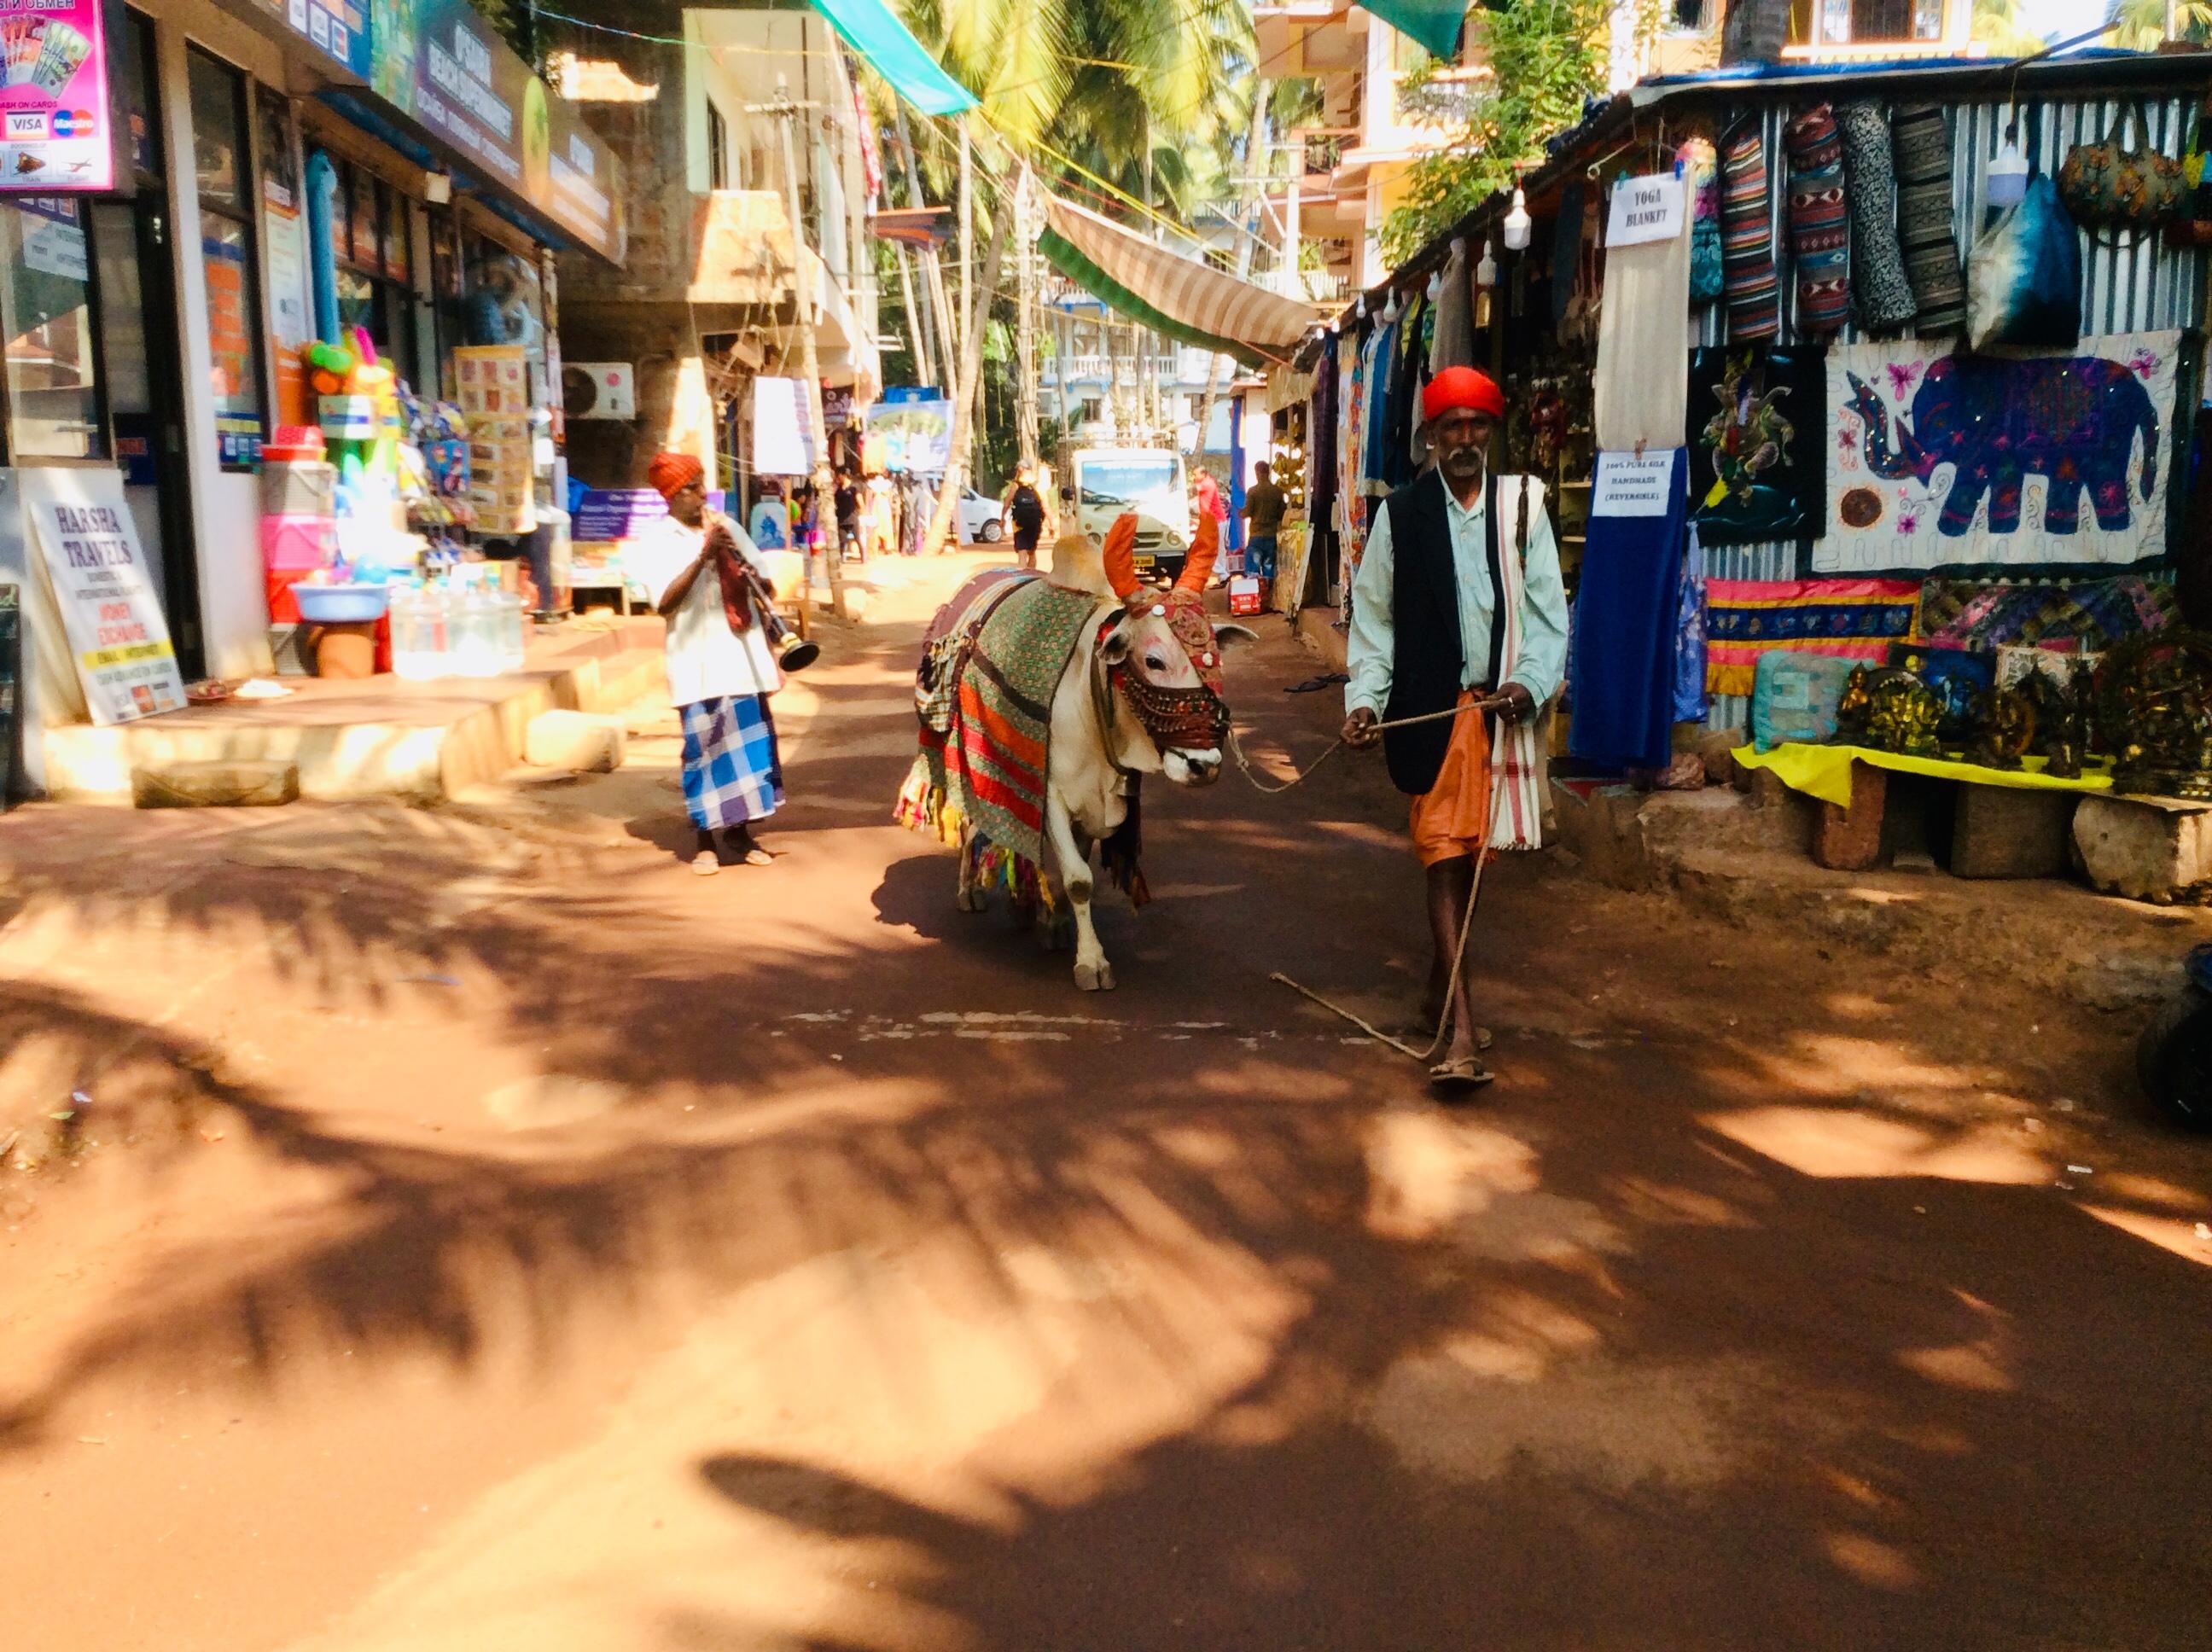 Street in Goa